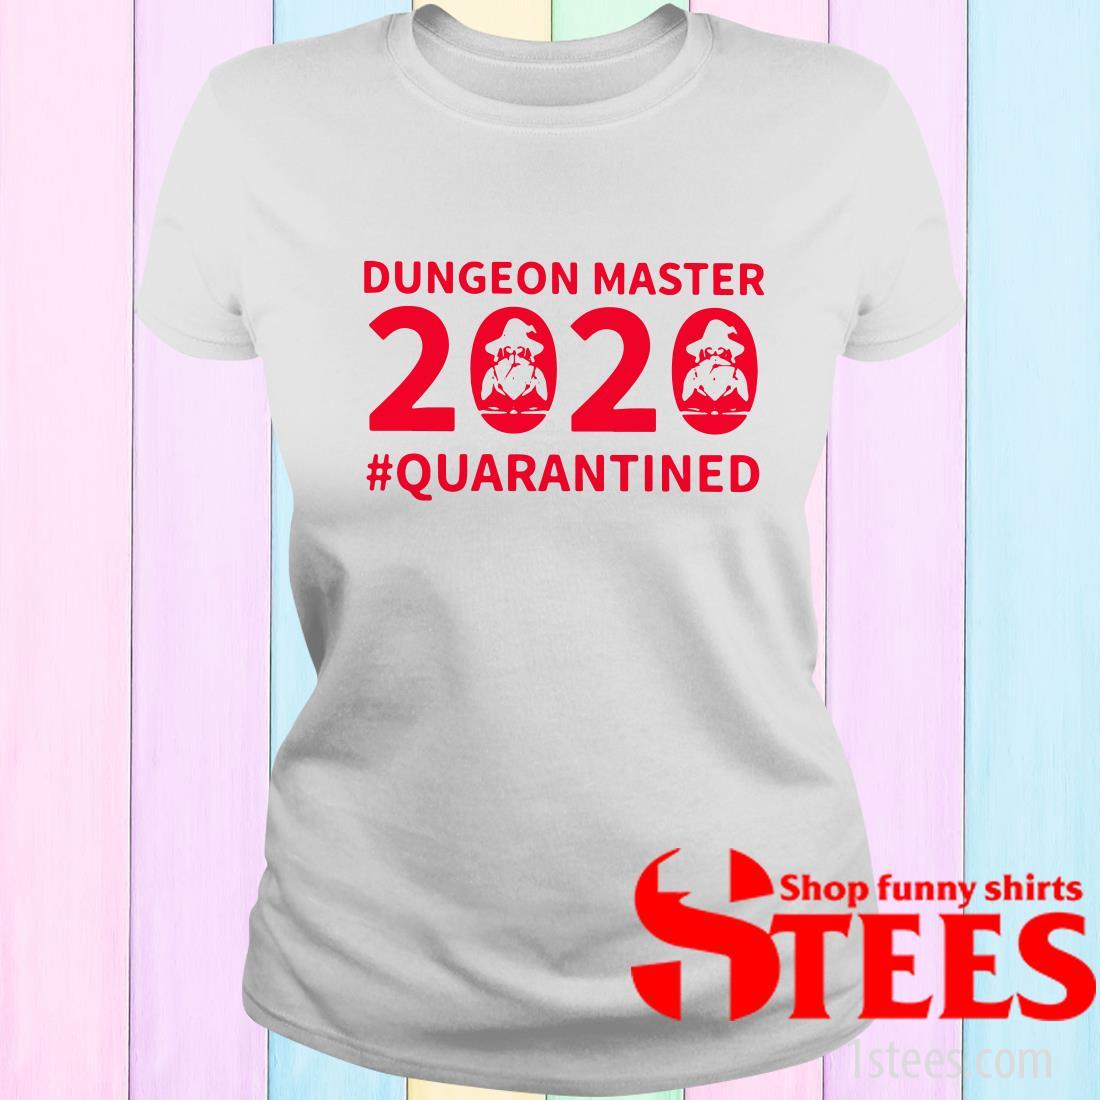 Hot Dungeon Master 2020 Quarantined Shirt